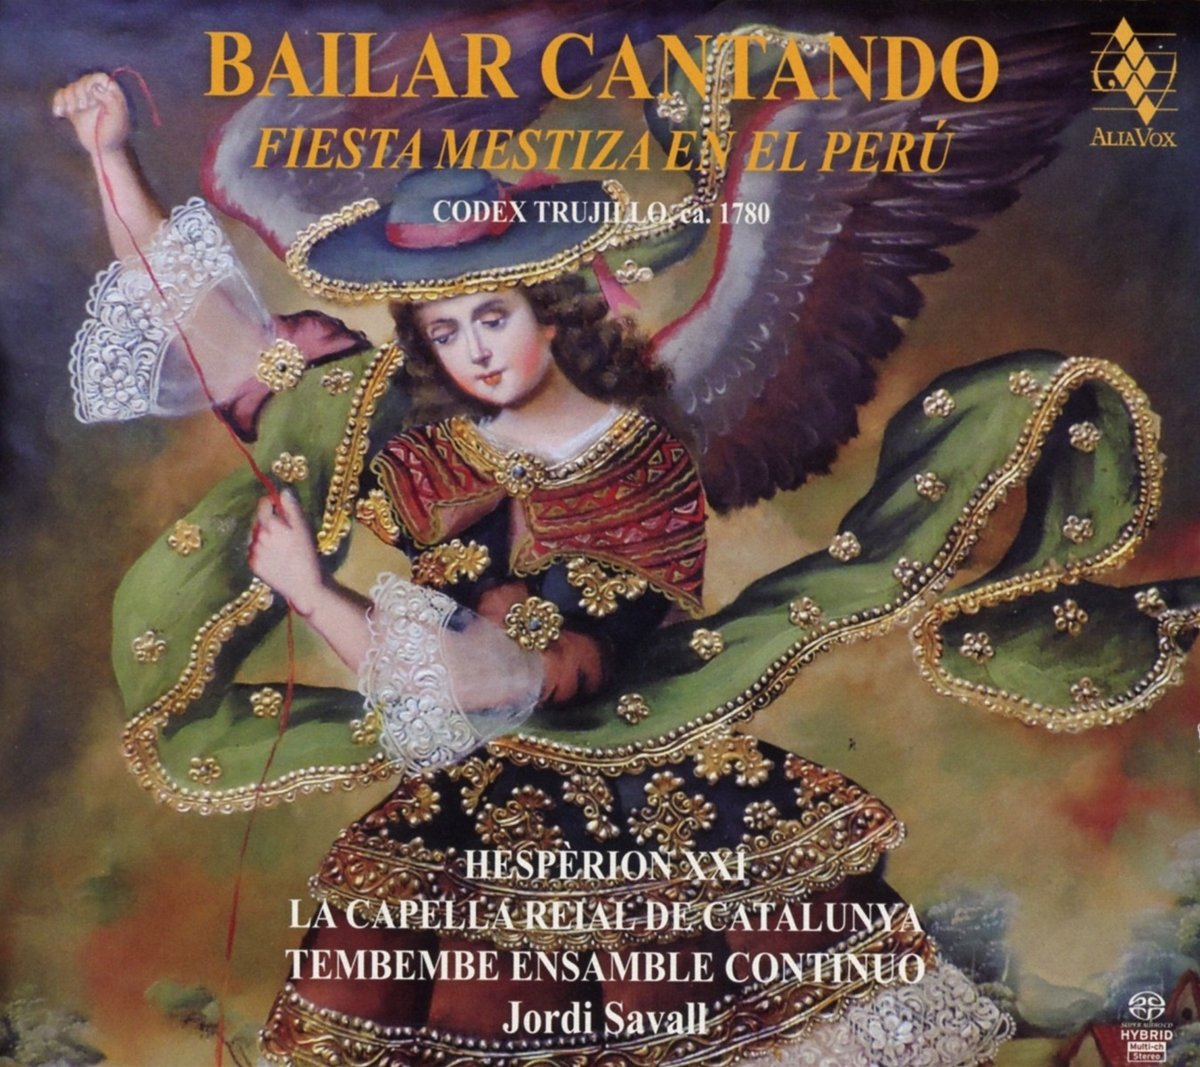 SACD : Jordi Savall - Bailar Cantando - Fiesta Mestiza En El Peru (SACD)